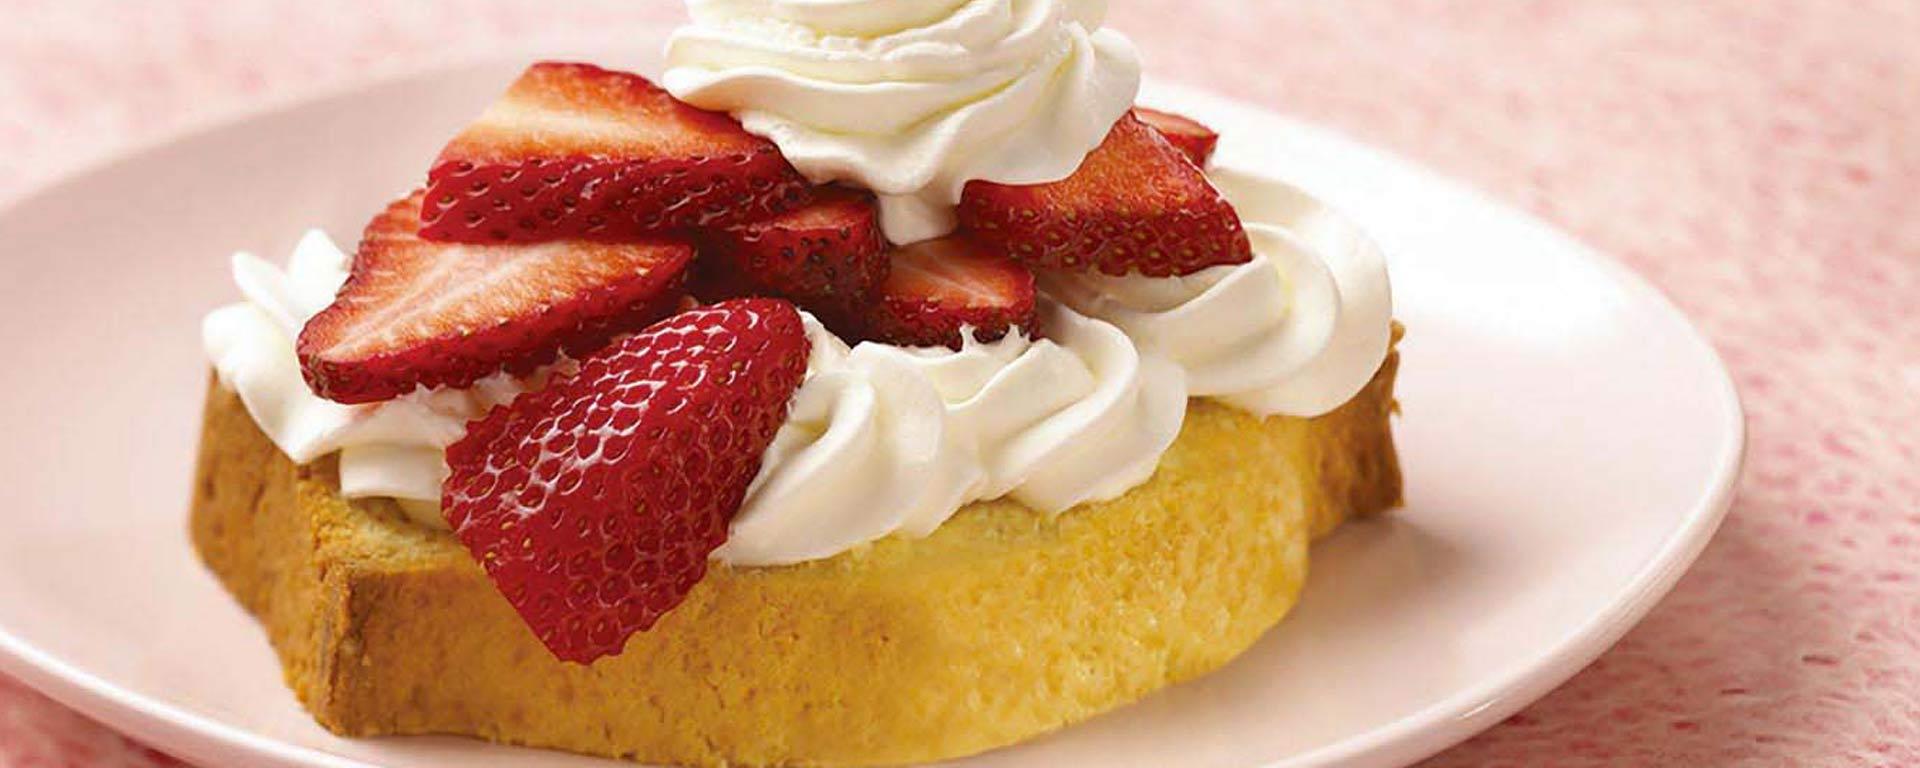 Photo for - Strawberry Shortcake